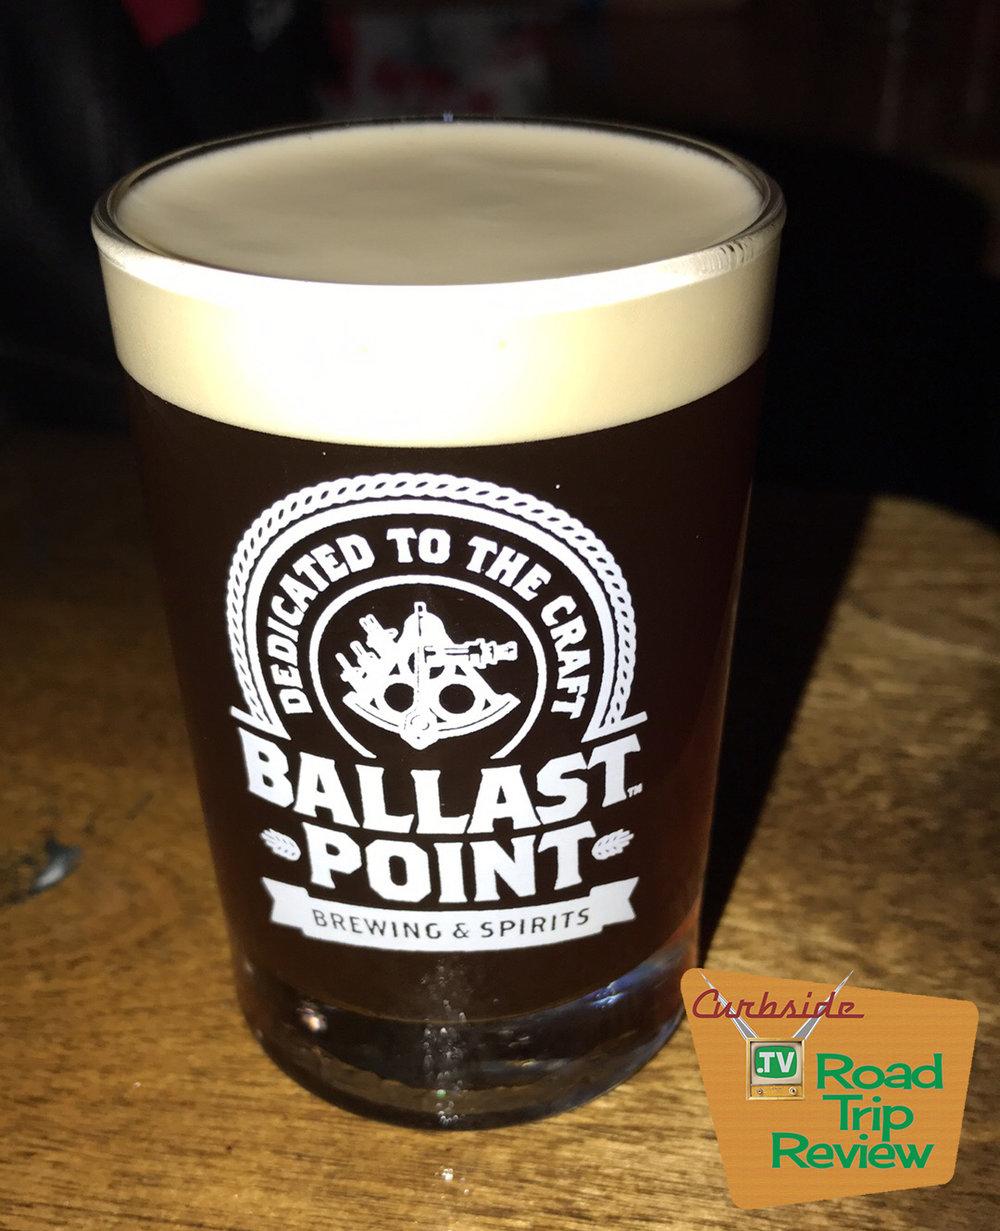 Ballast Point Brewery shot glass